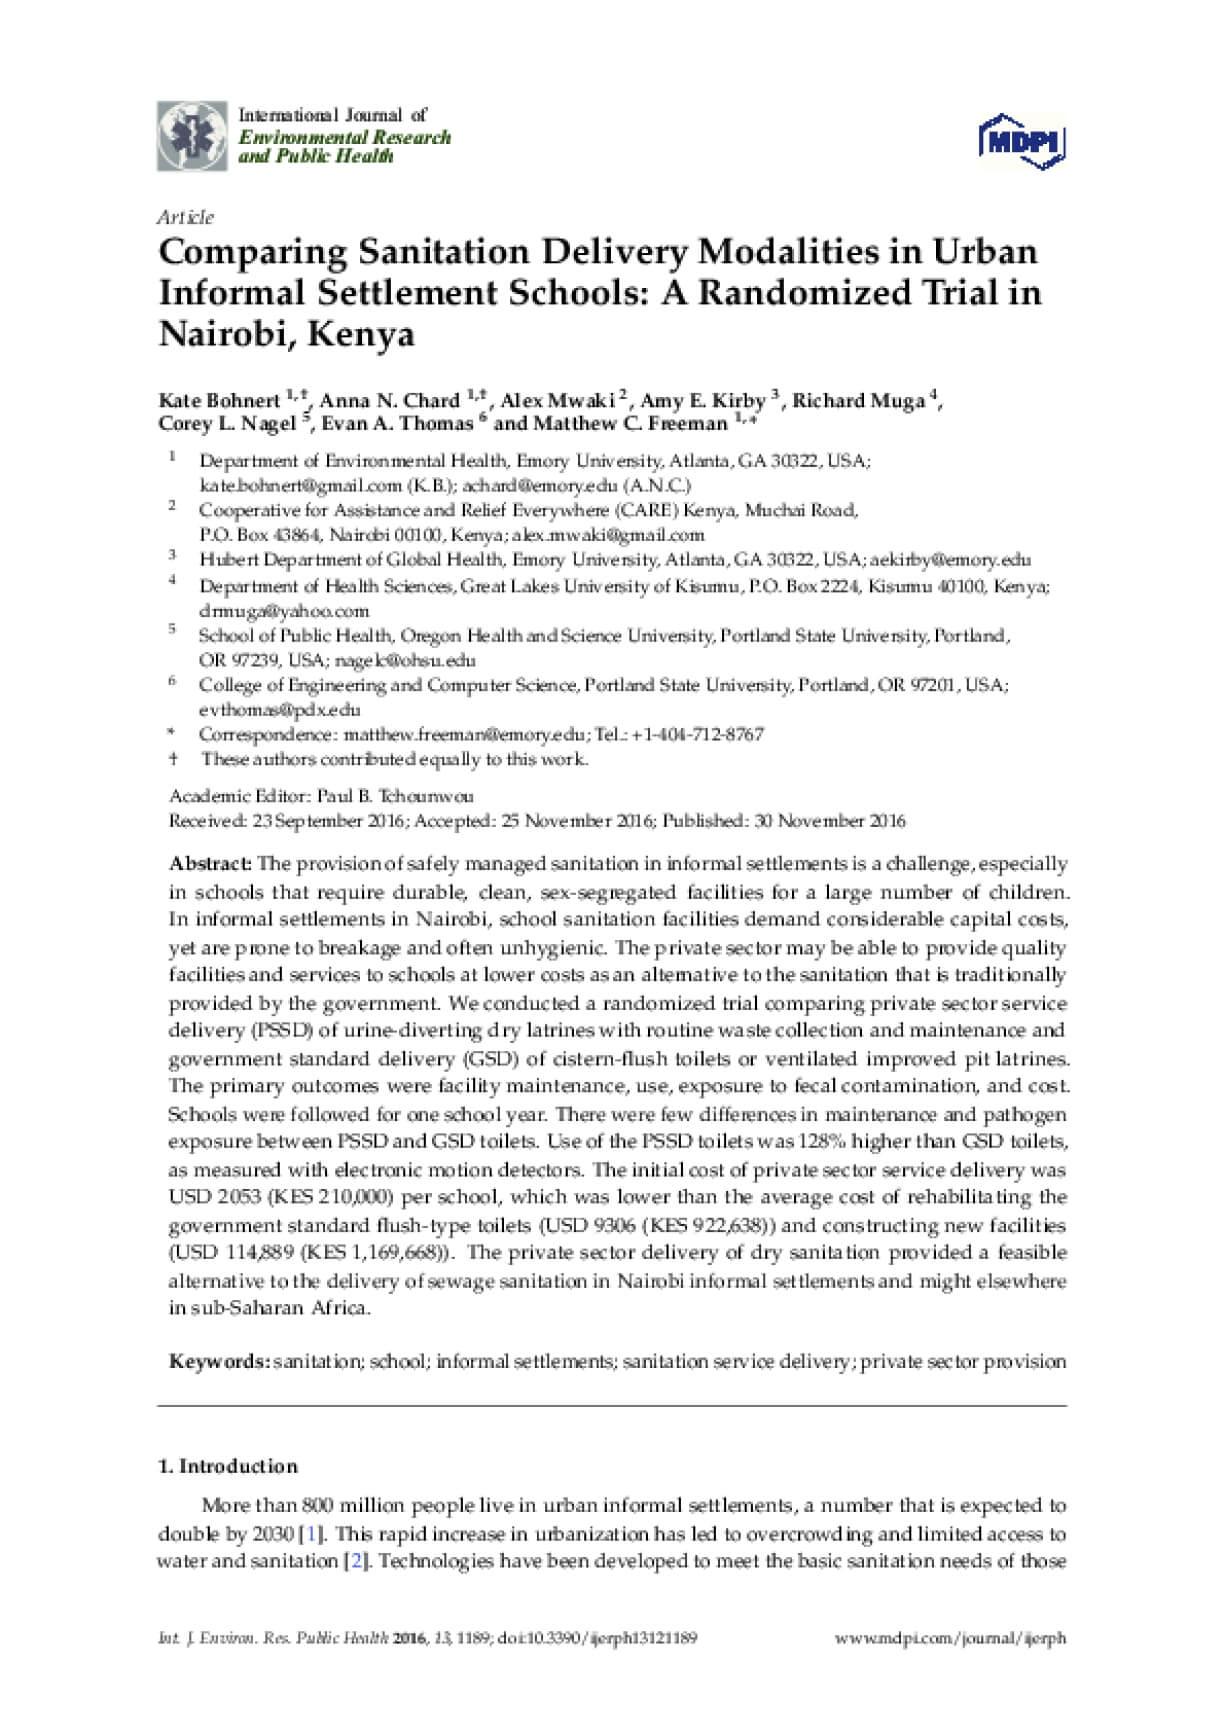 Comparing Sanitation Delivery Modalities in Urban Informal Settlement Schools: A Randomized Trial in Nairobi, Kenya